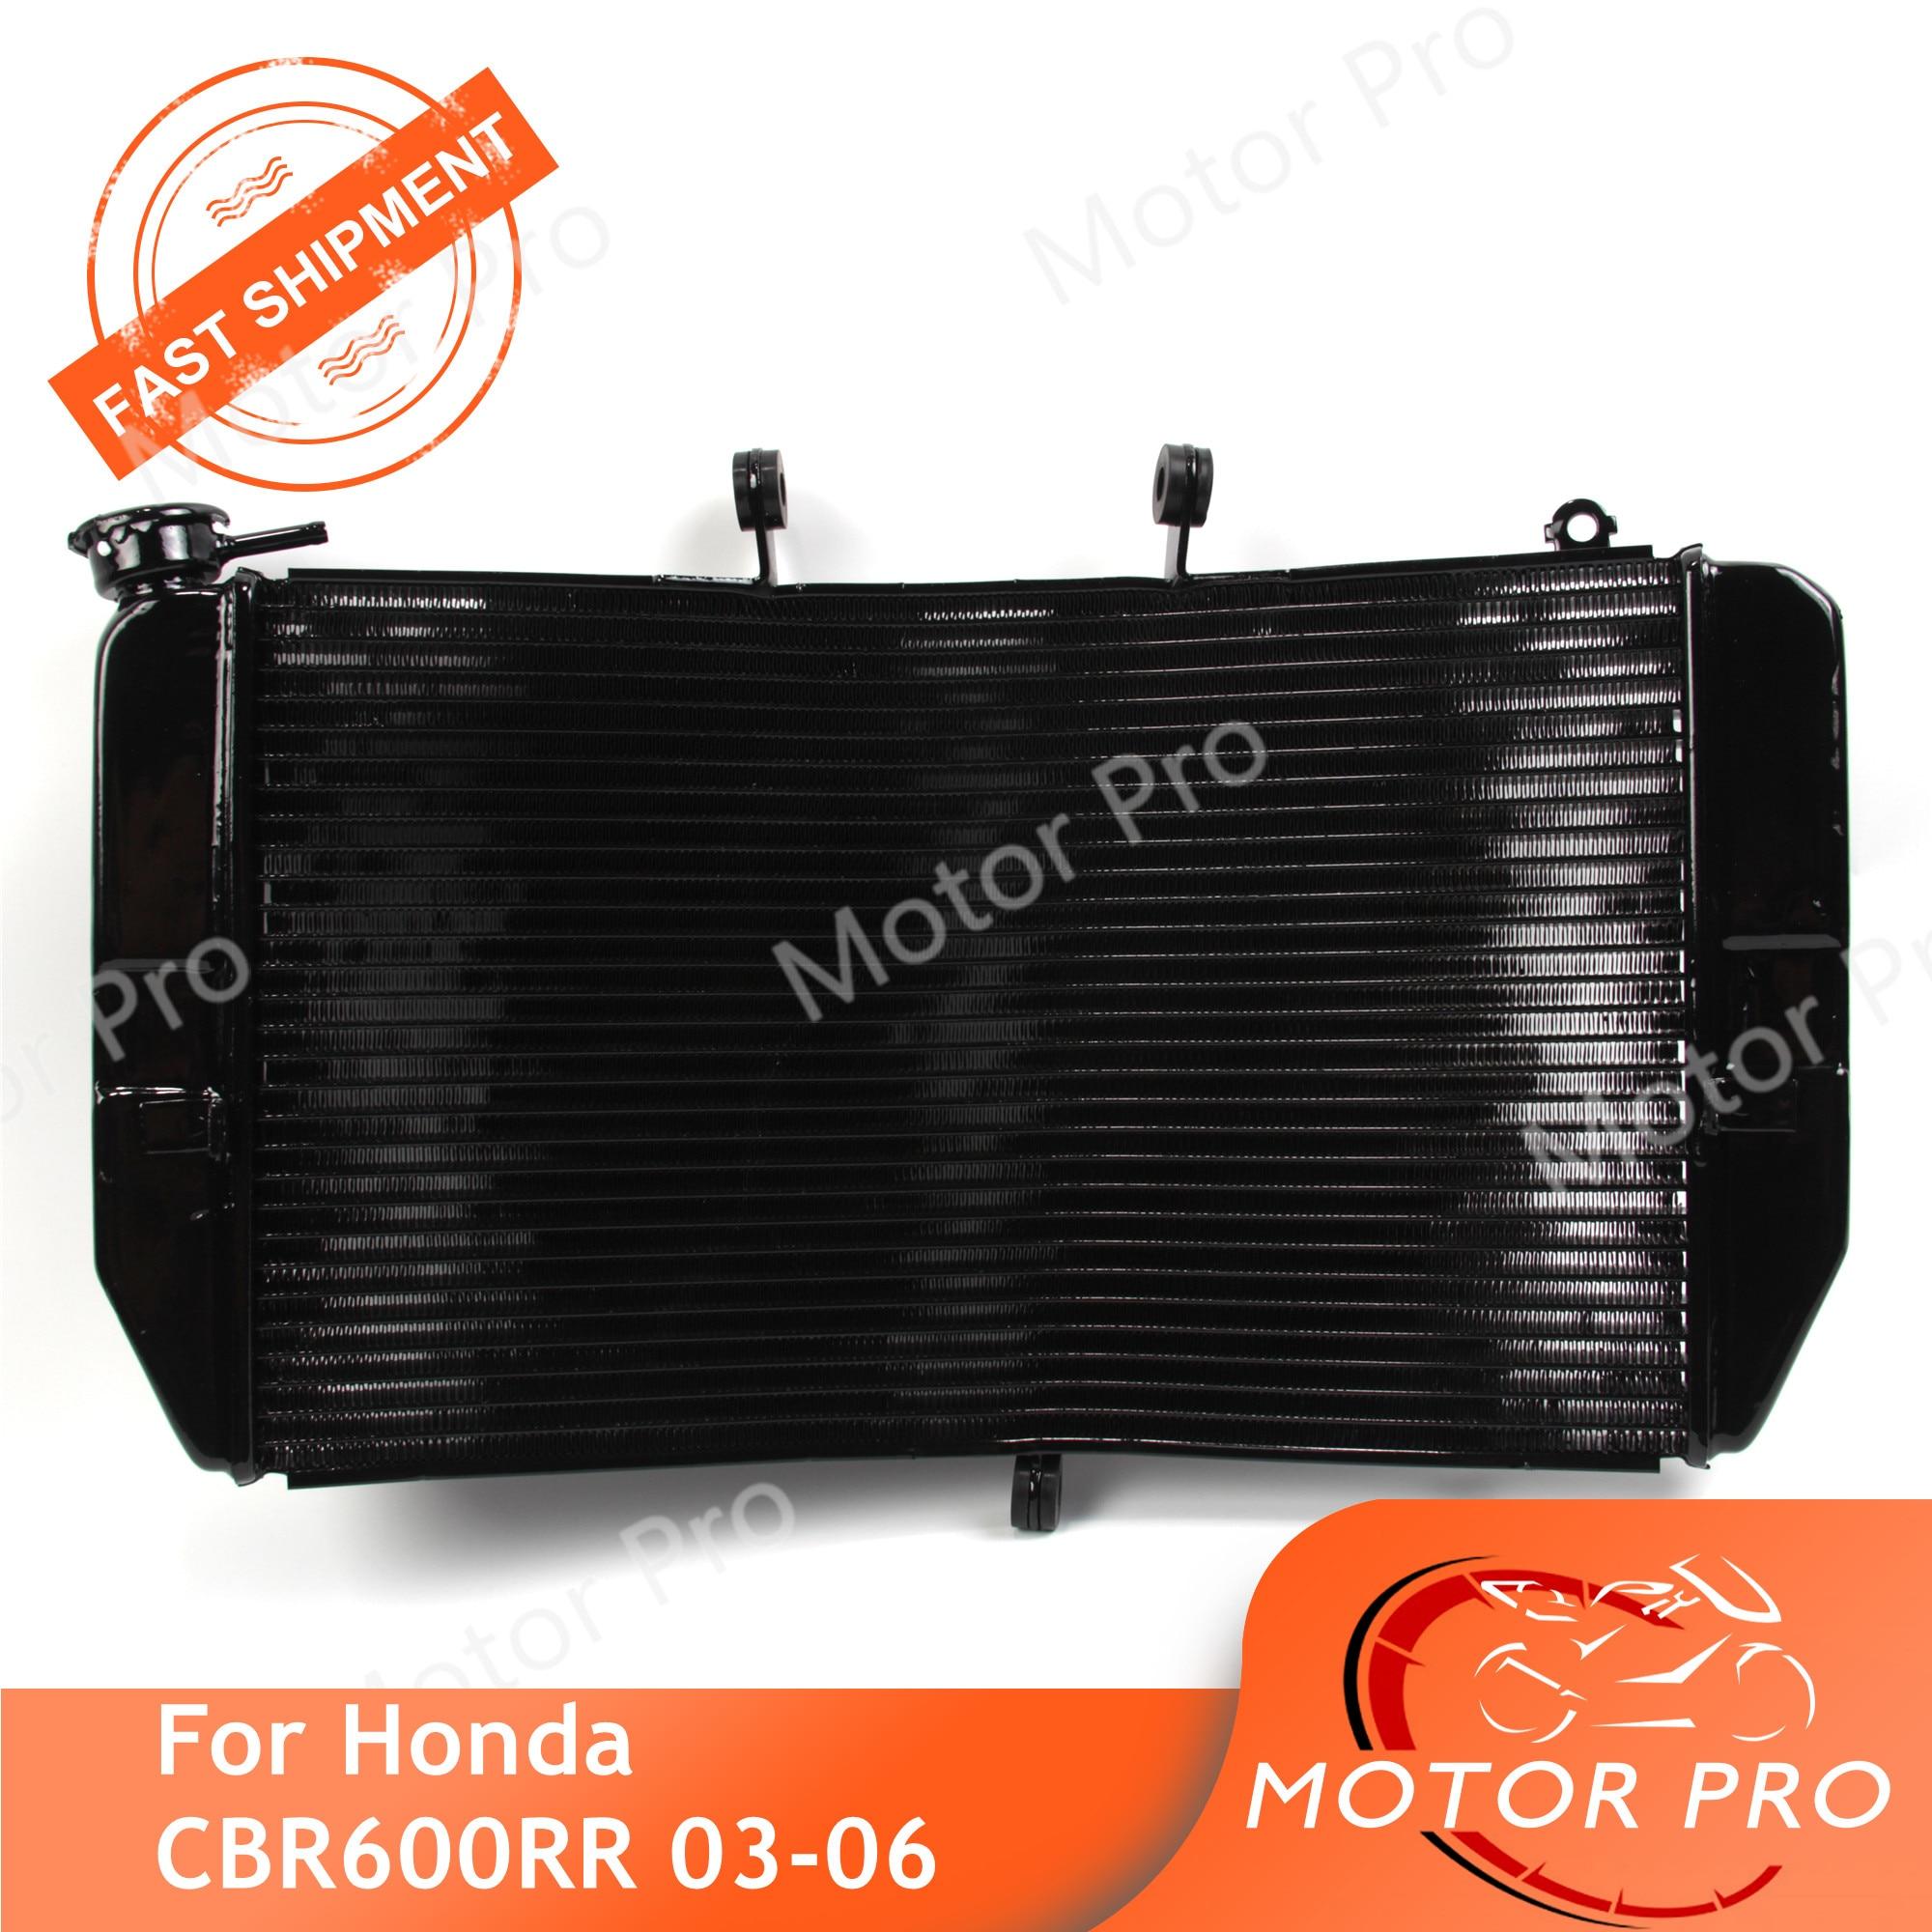 Moto radiador de alumínio para honda cbr600rr 2003 2004 2005 2006 cooler acessórios cbr 600 rr cbr600 600rr 600cc